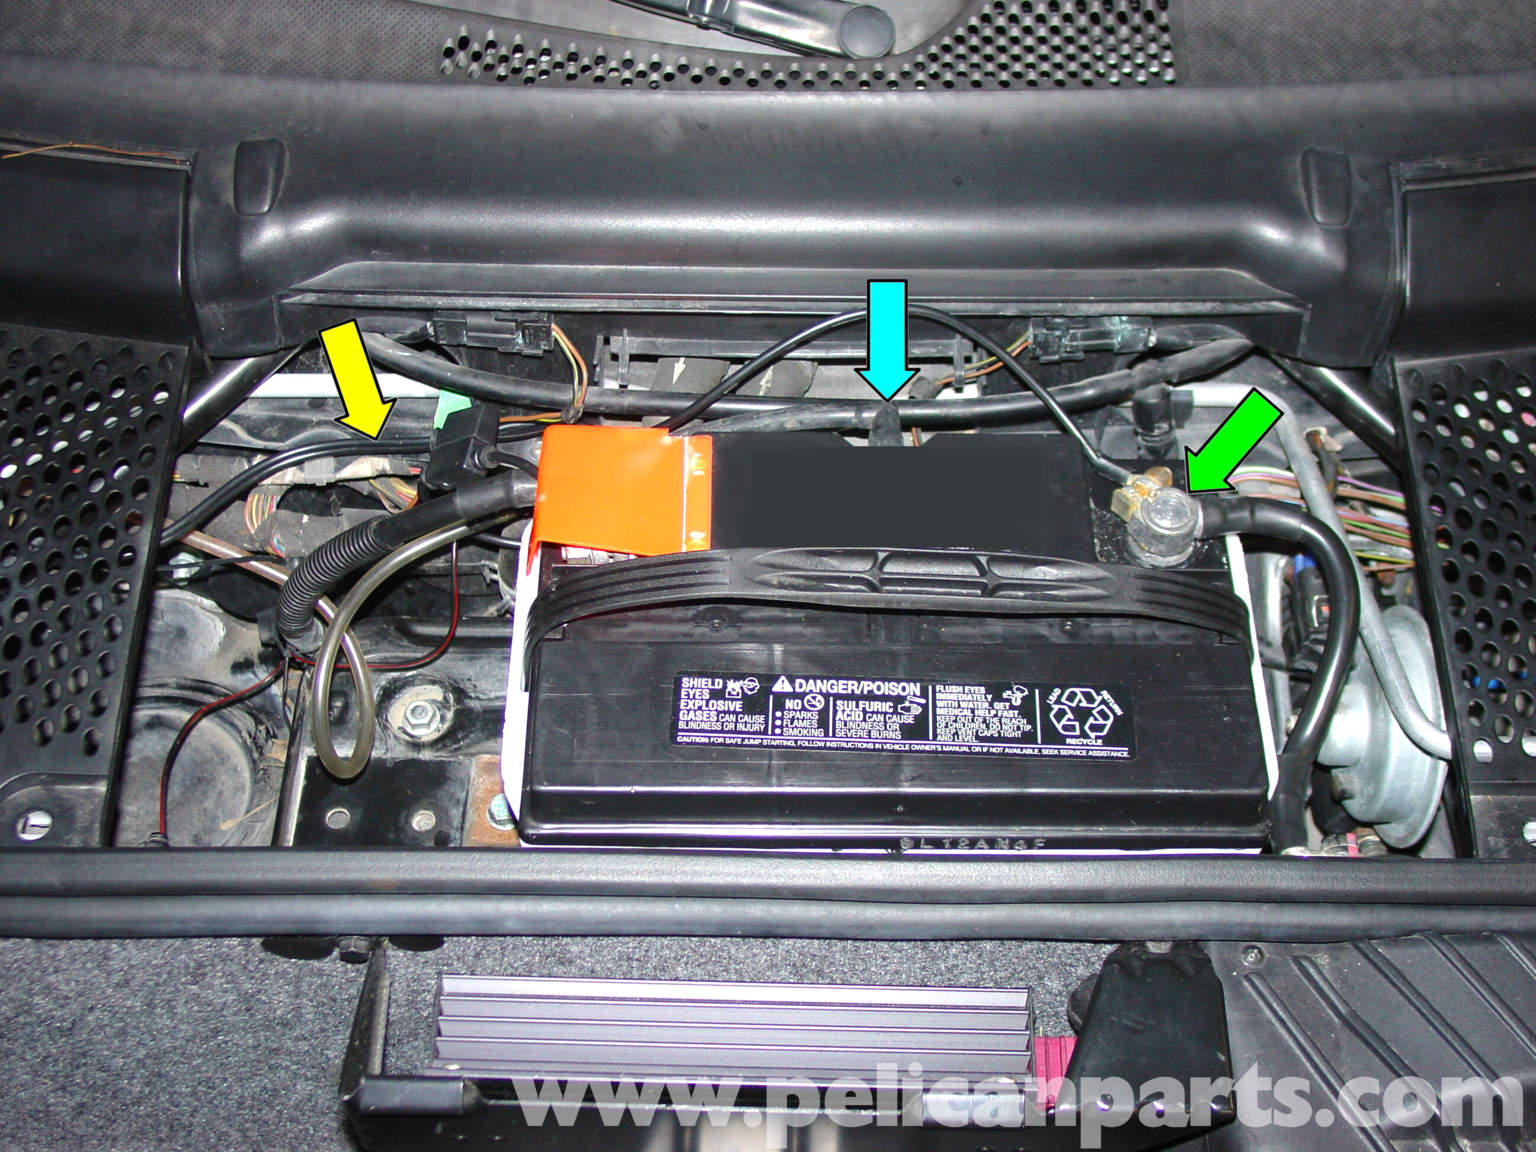 Jaguar xj8 battery location free download wiring diagram schematic